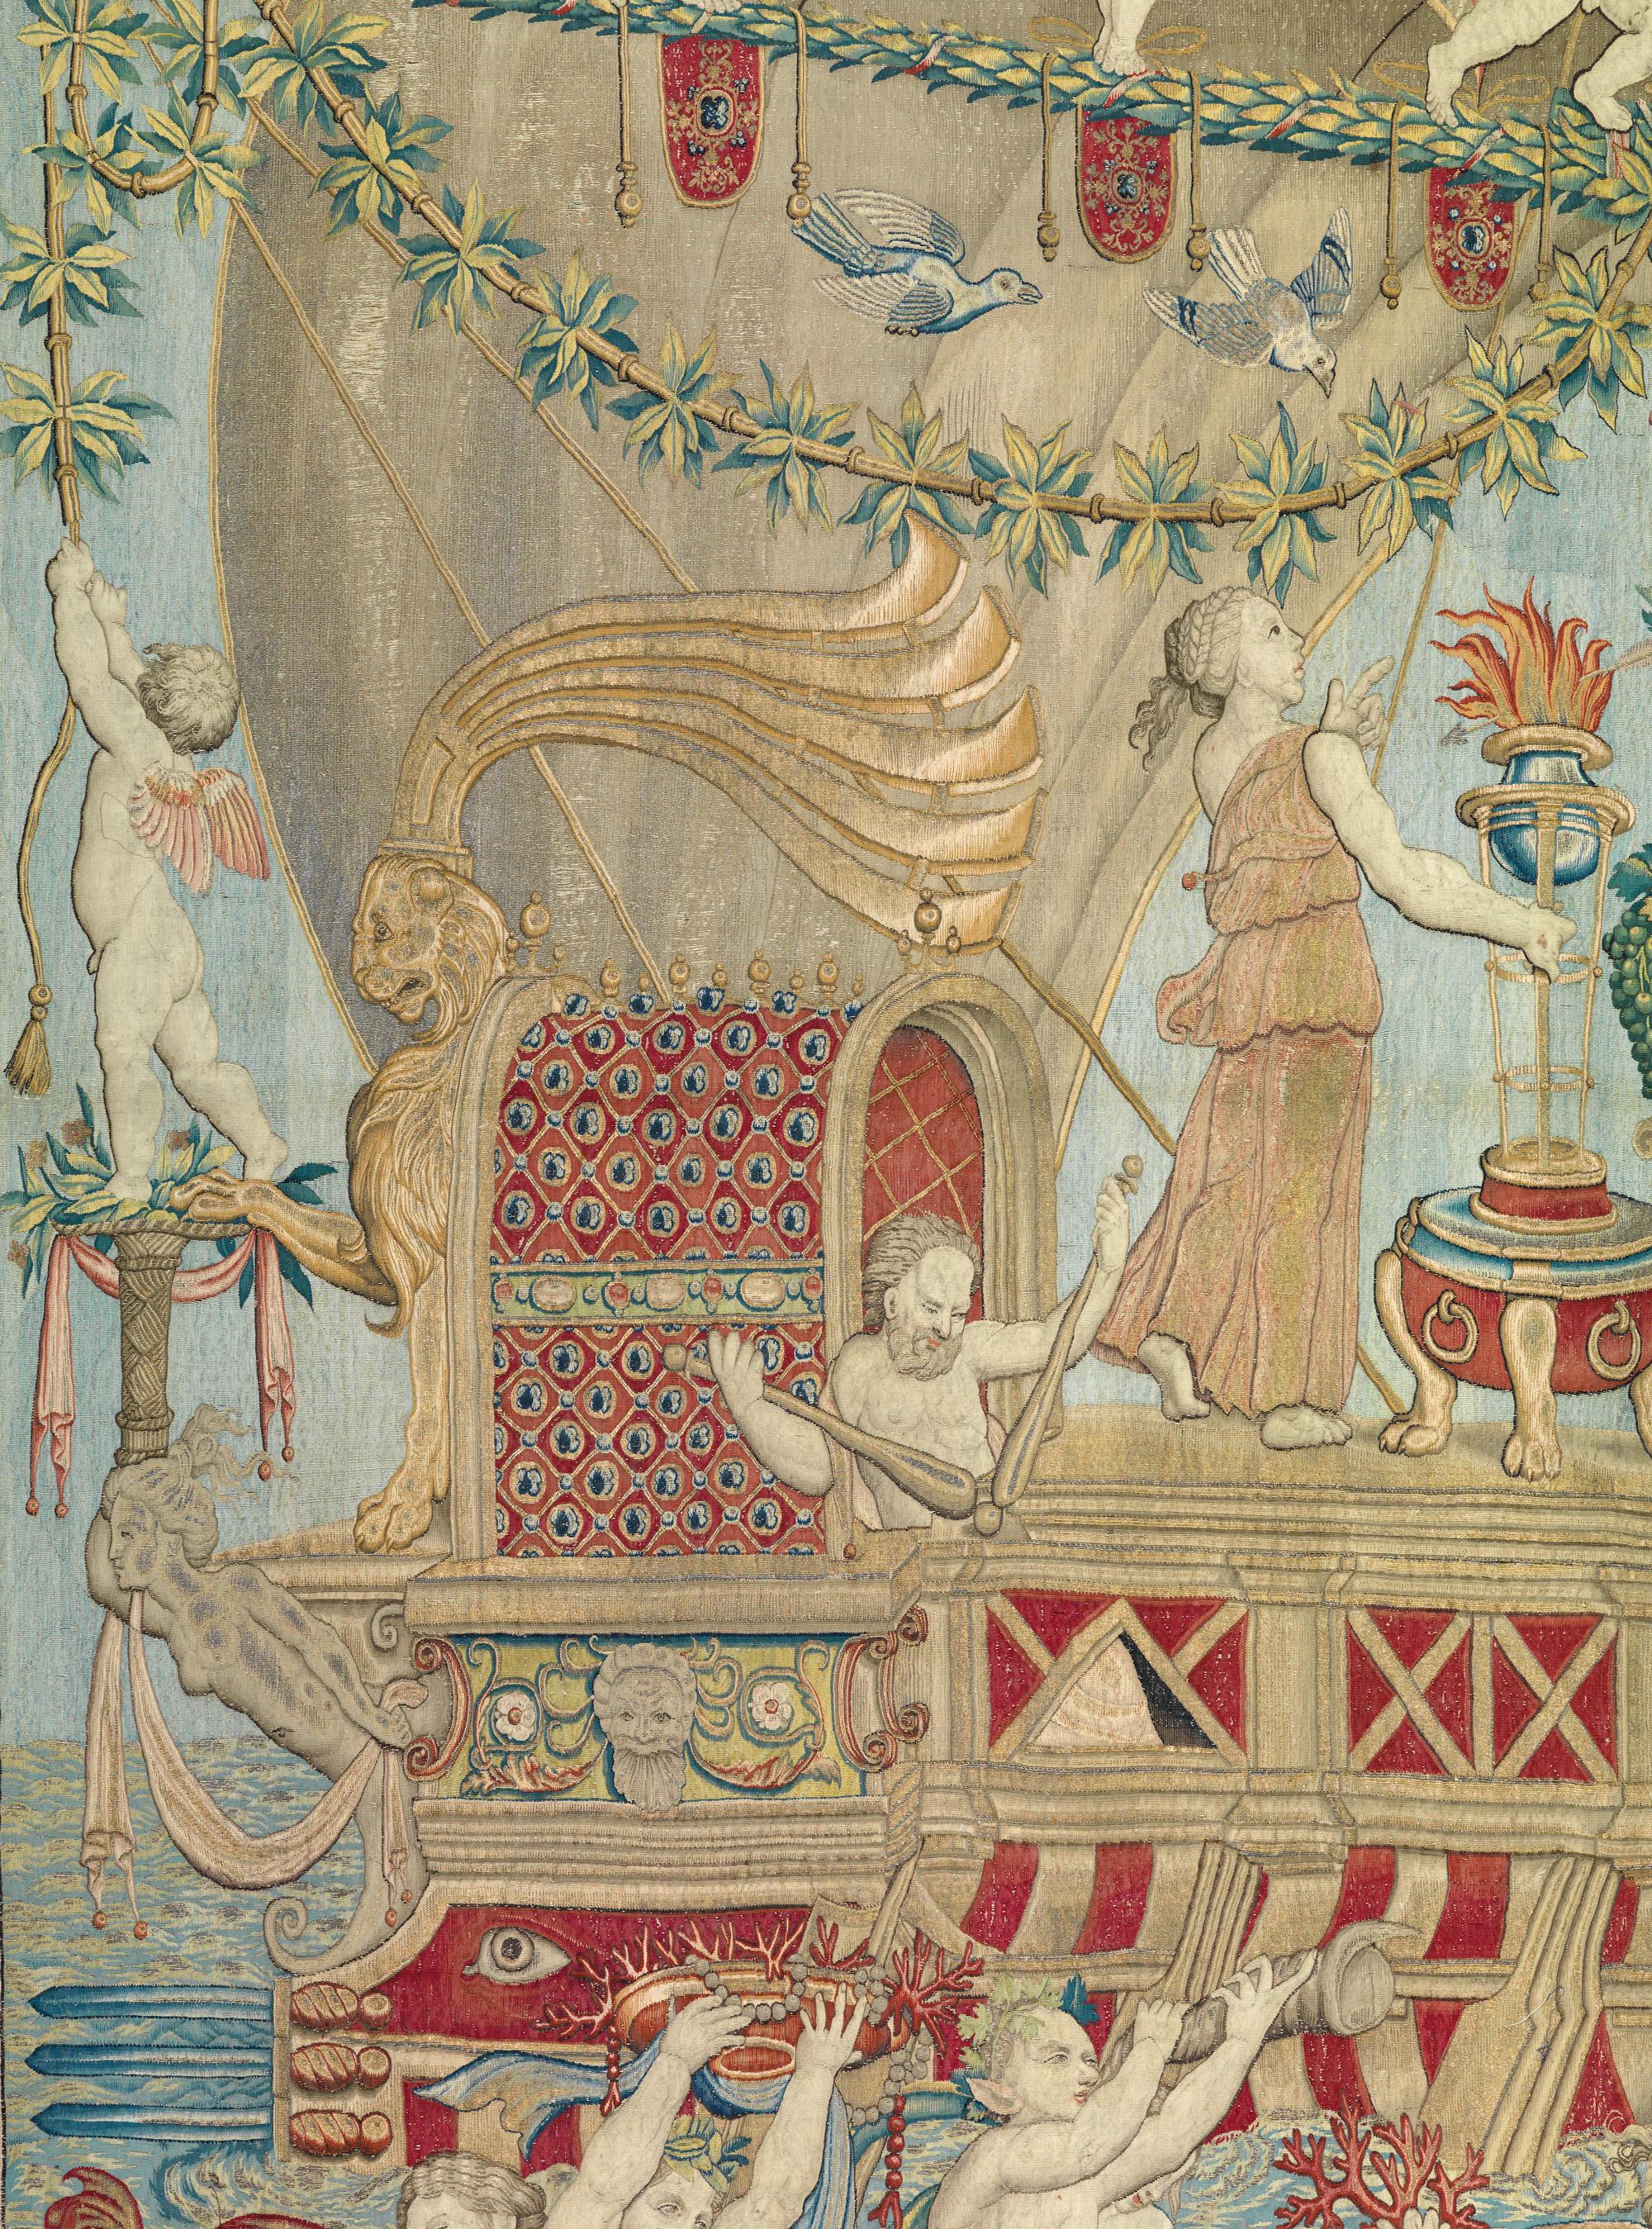 Raphael's Tapestries